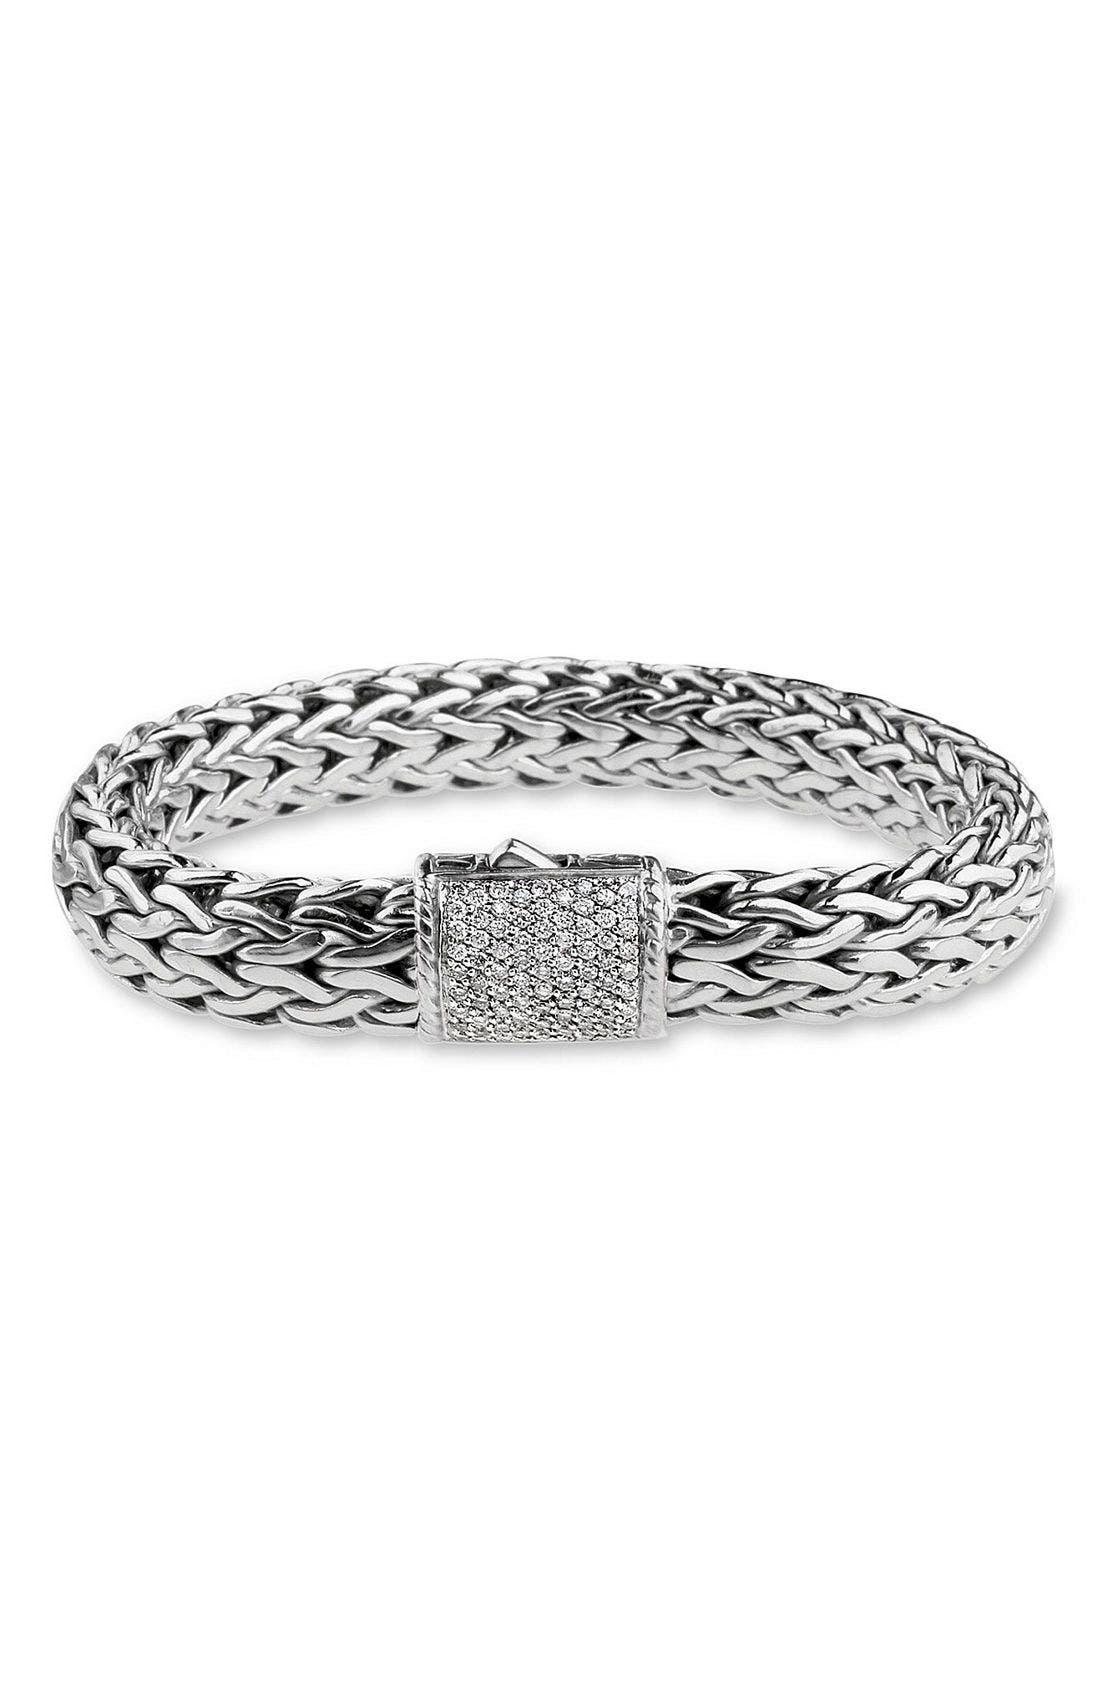 Alternate Image 1 Selected - John Hardy 'Classic Chain' Large Pavé Diamond Bracelet